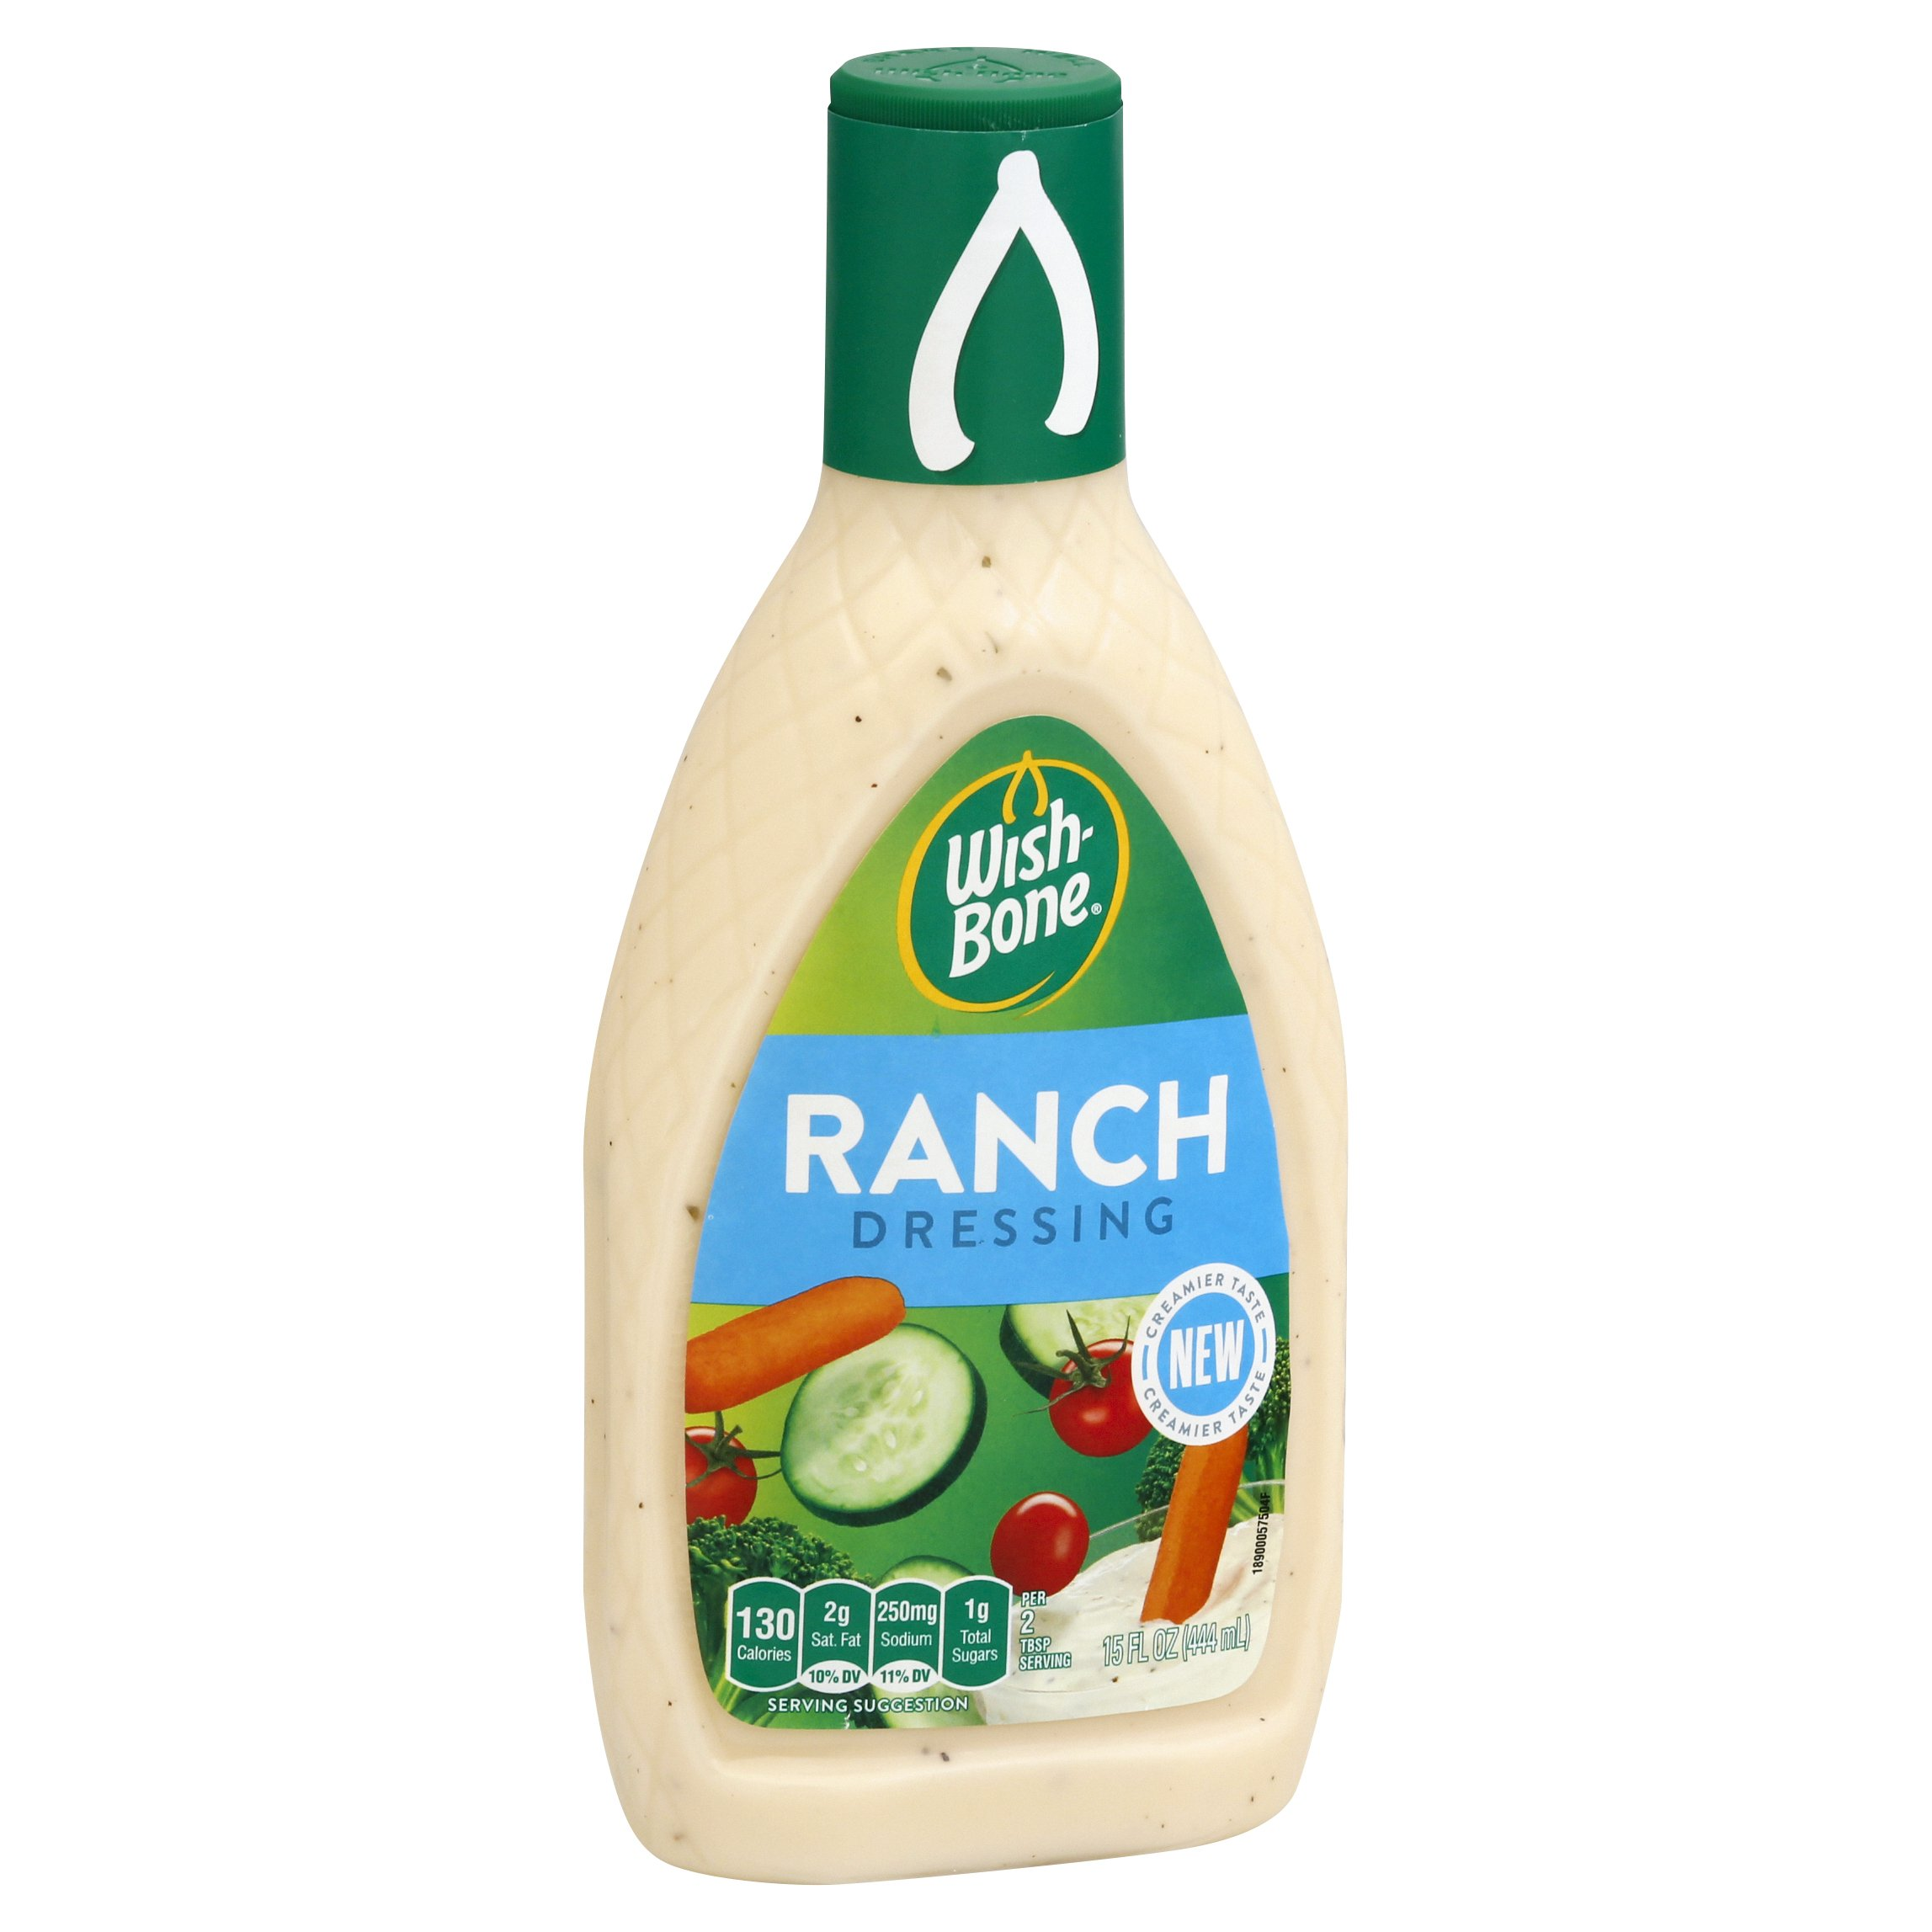 Wish-Bone Ranch Dressing 15OZ 6-Pack